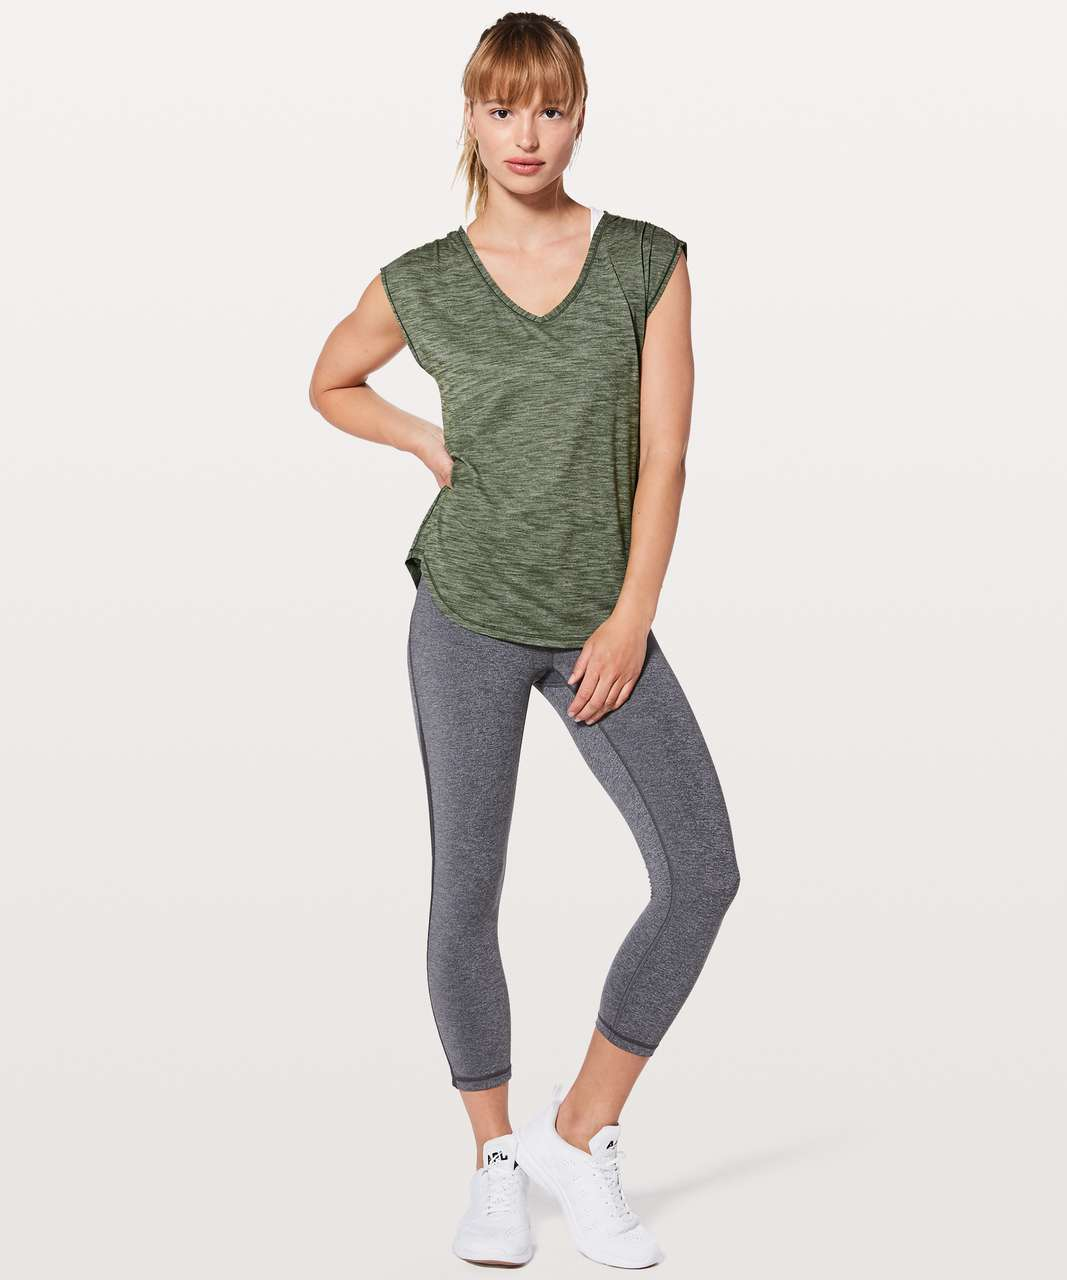 Lululemon Sweat Times Short Sleeve - Heathered Barracks Green